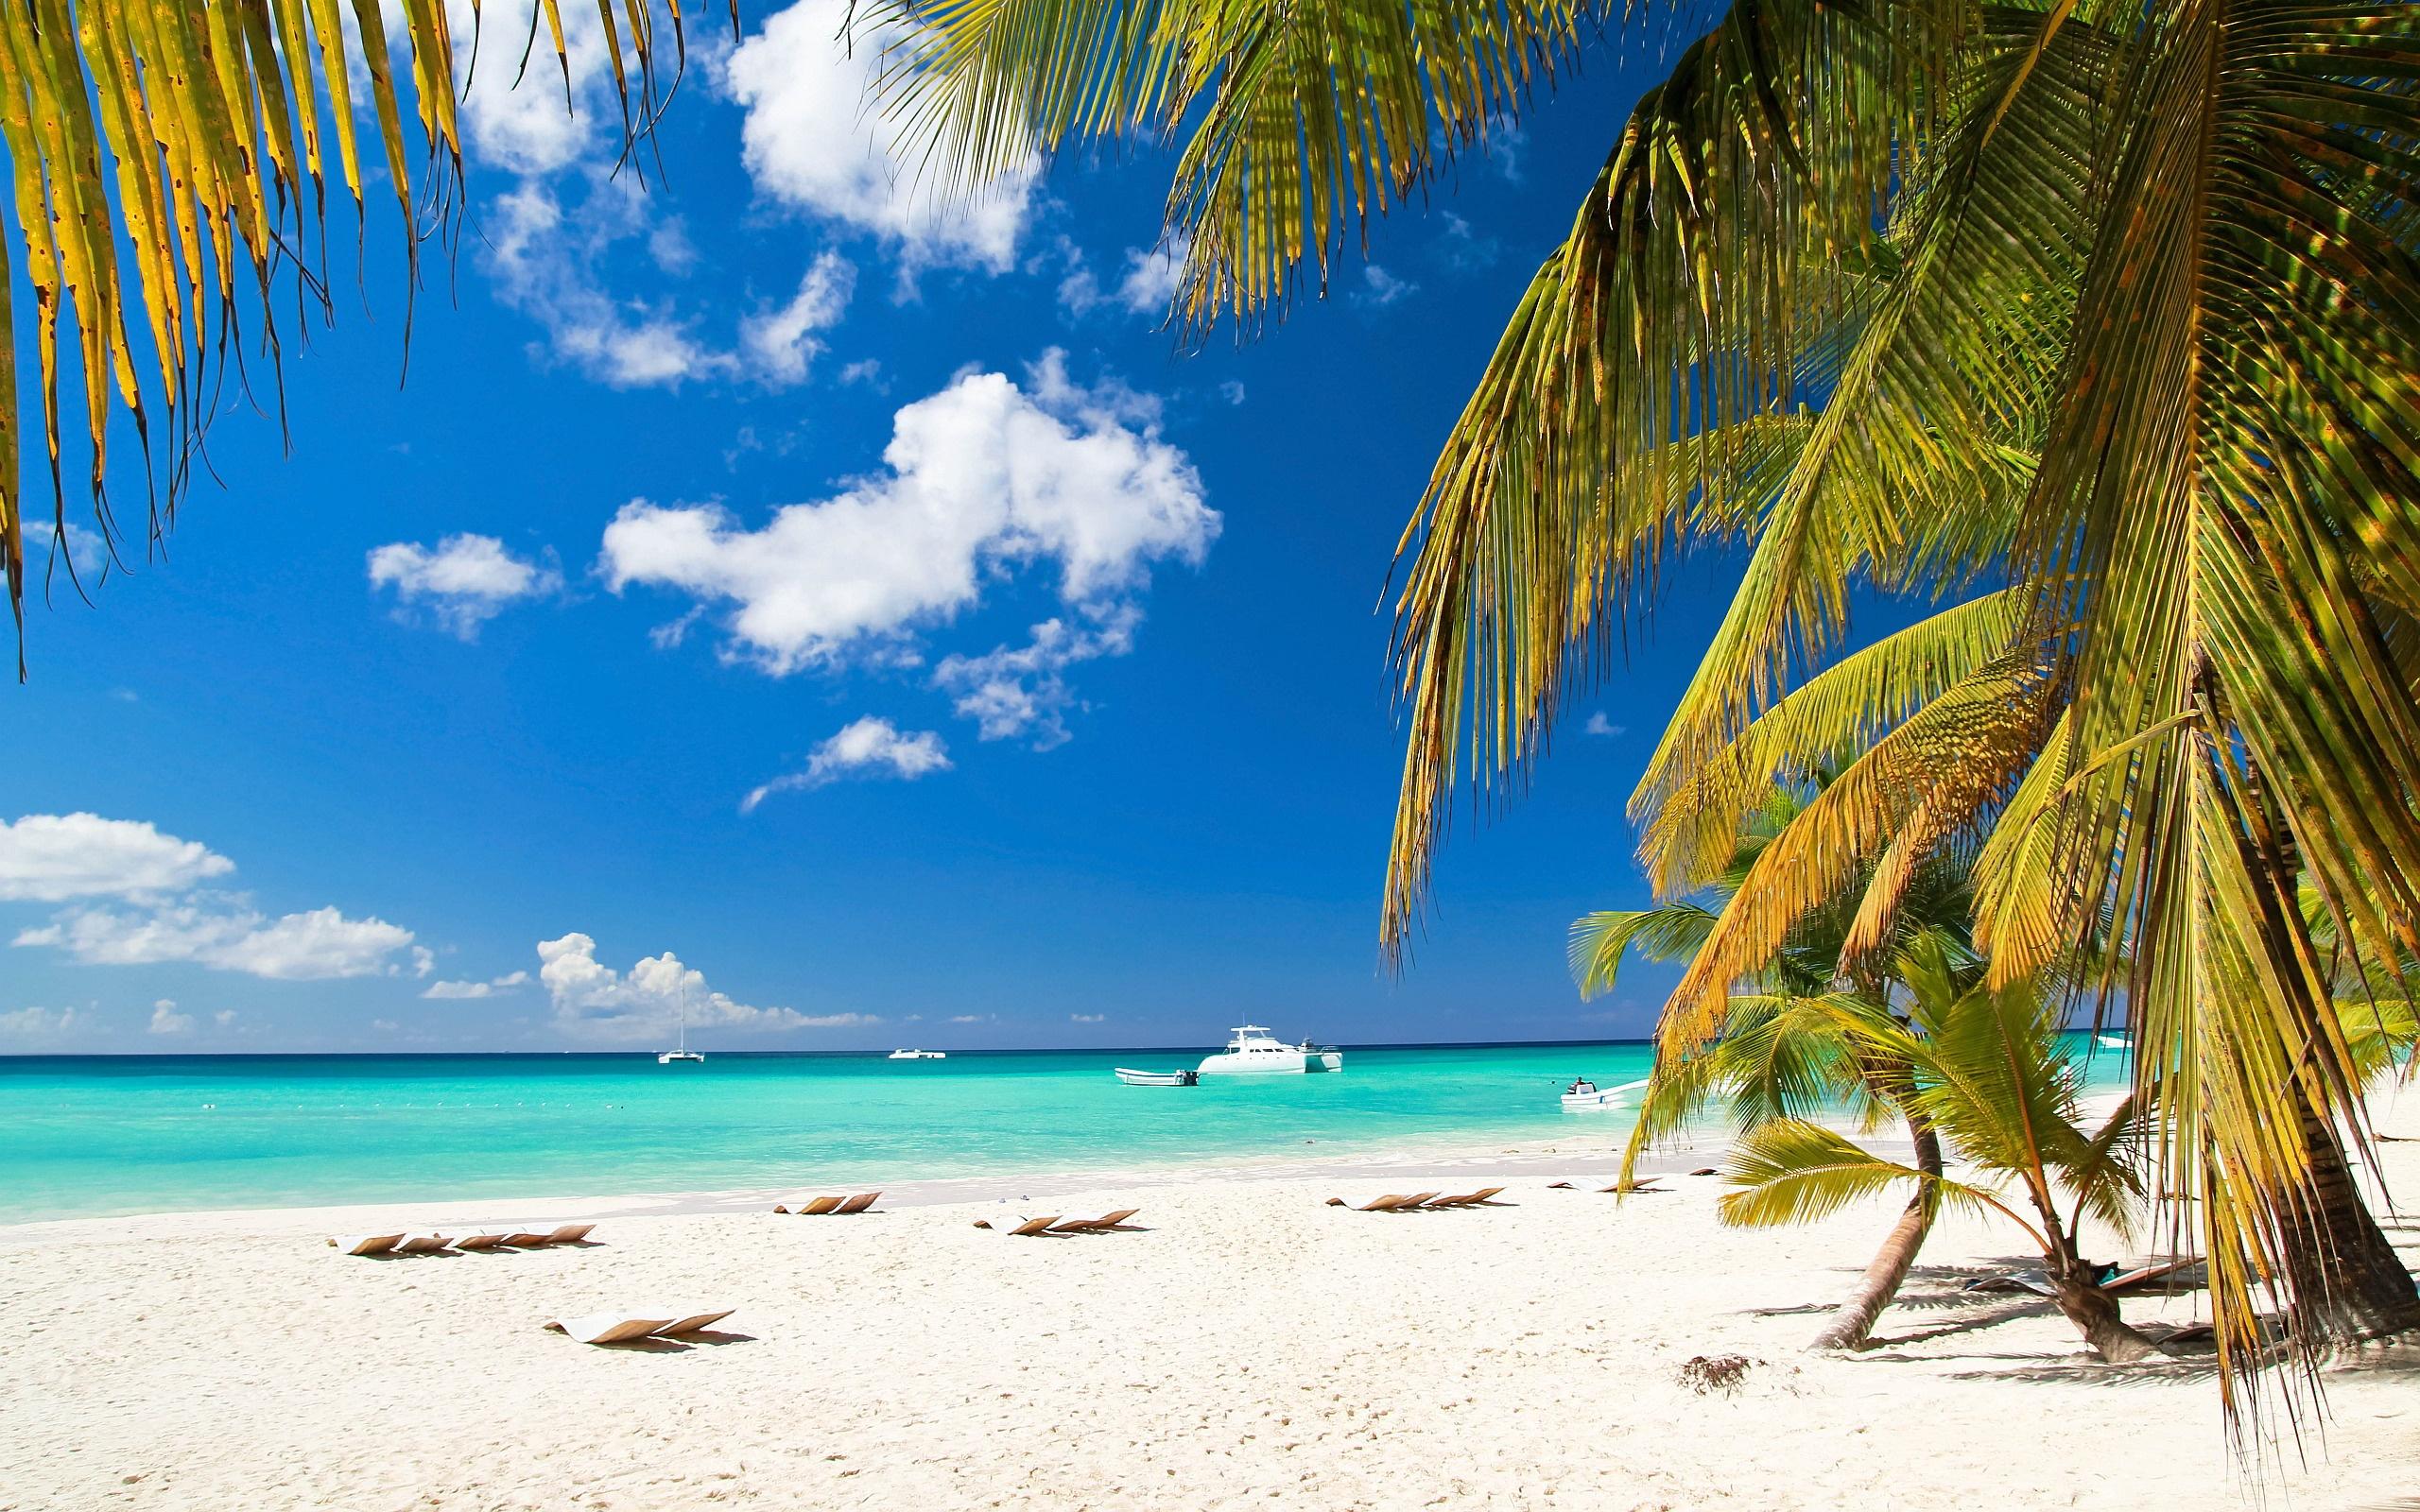 Beach Palms Ships Wallpaper in 2560x1600 Widescreen